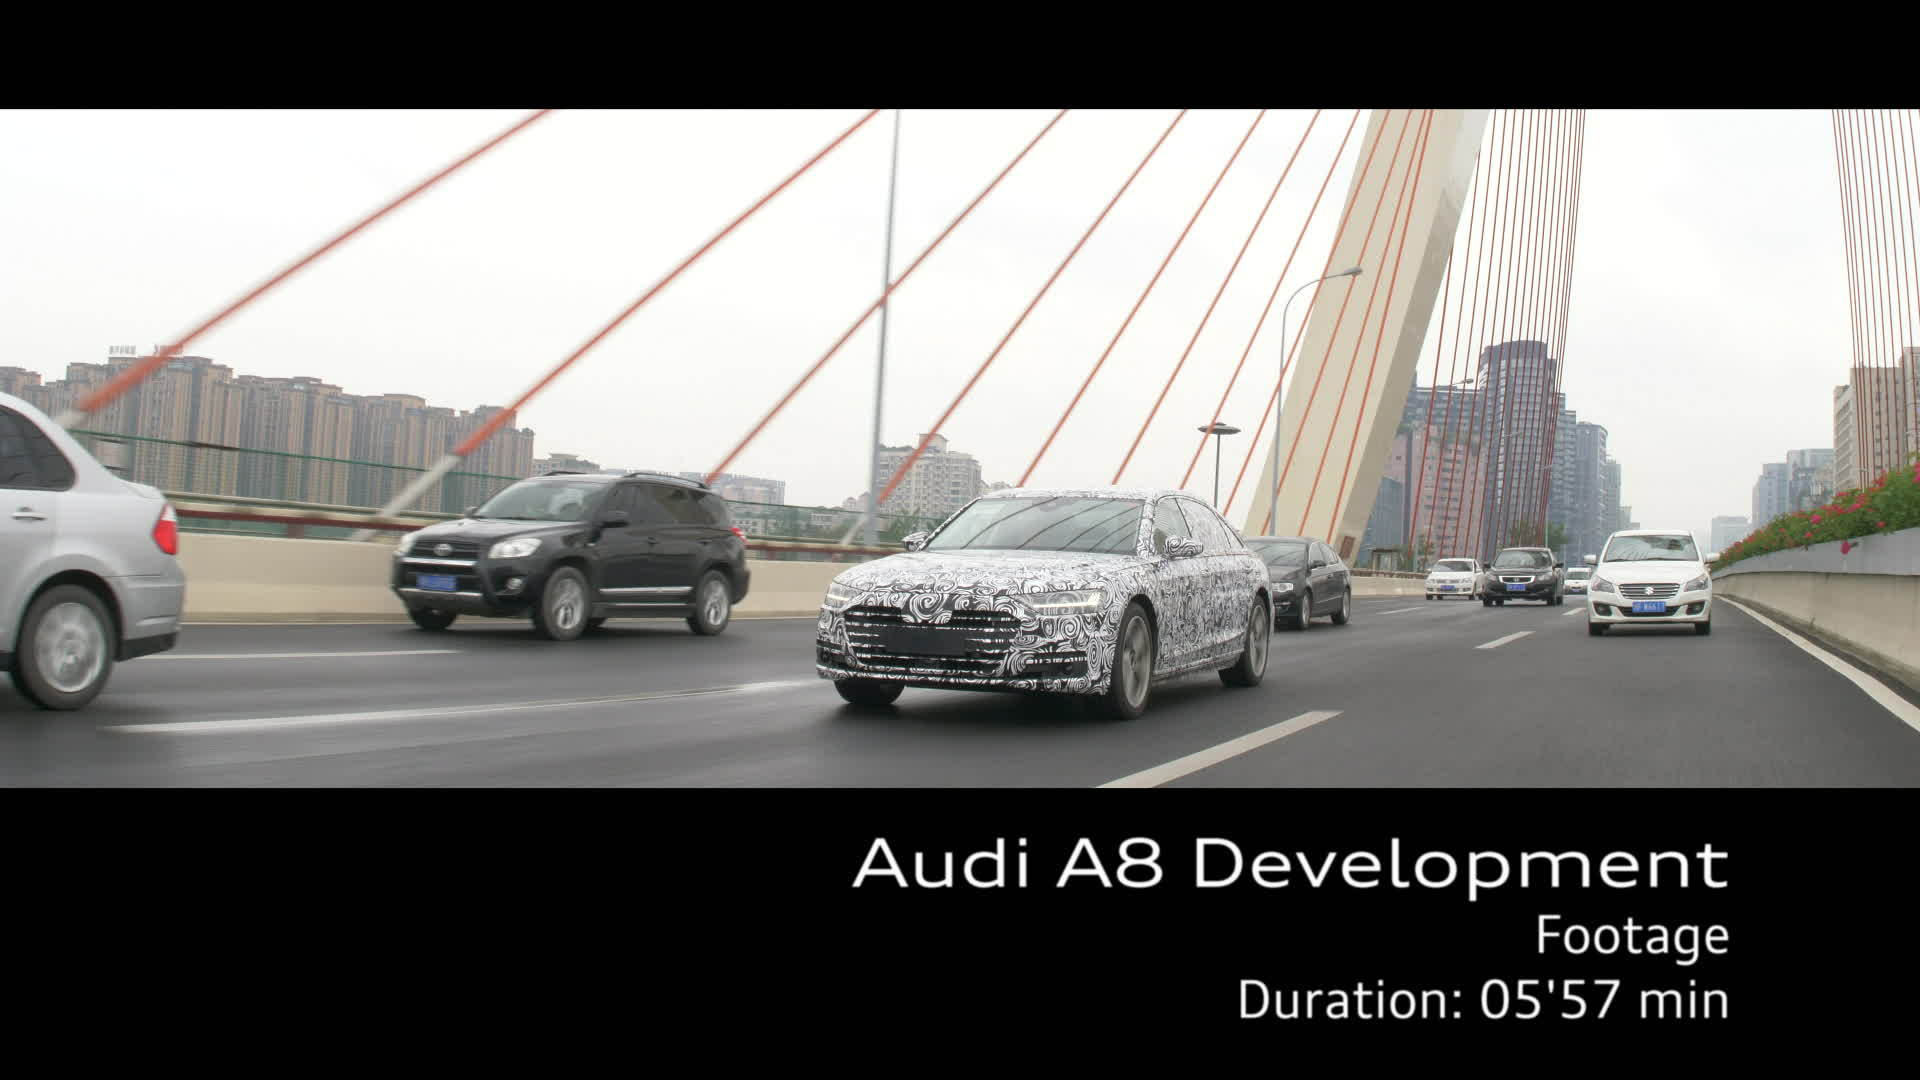 Audi A8 – Footage Development